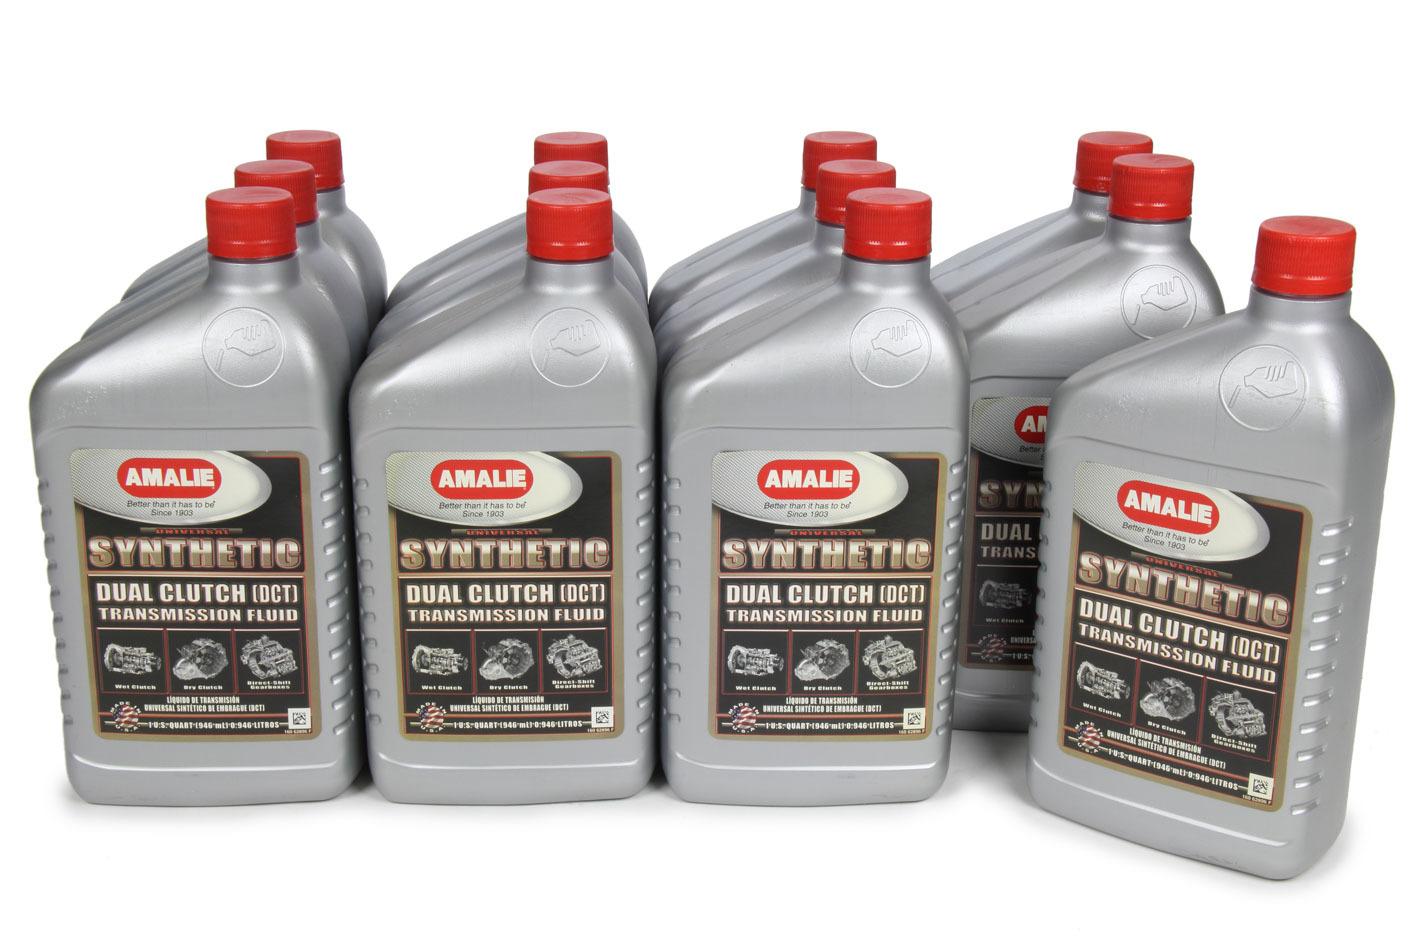 Amalie 160-62896-56 Transmission Fluid, DCT, Dual Clutch Transmissions, Synthetic, 1 qt Bottle, Set of 12